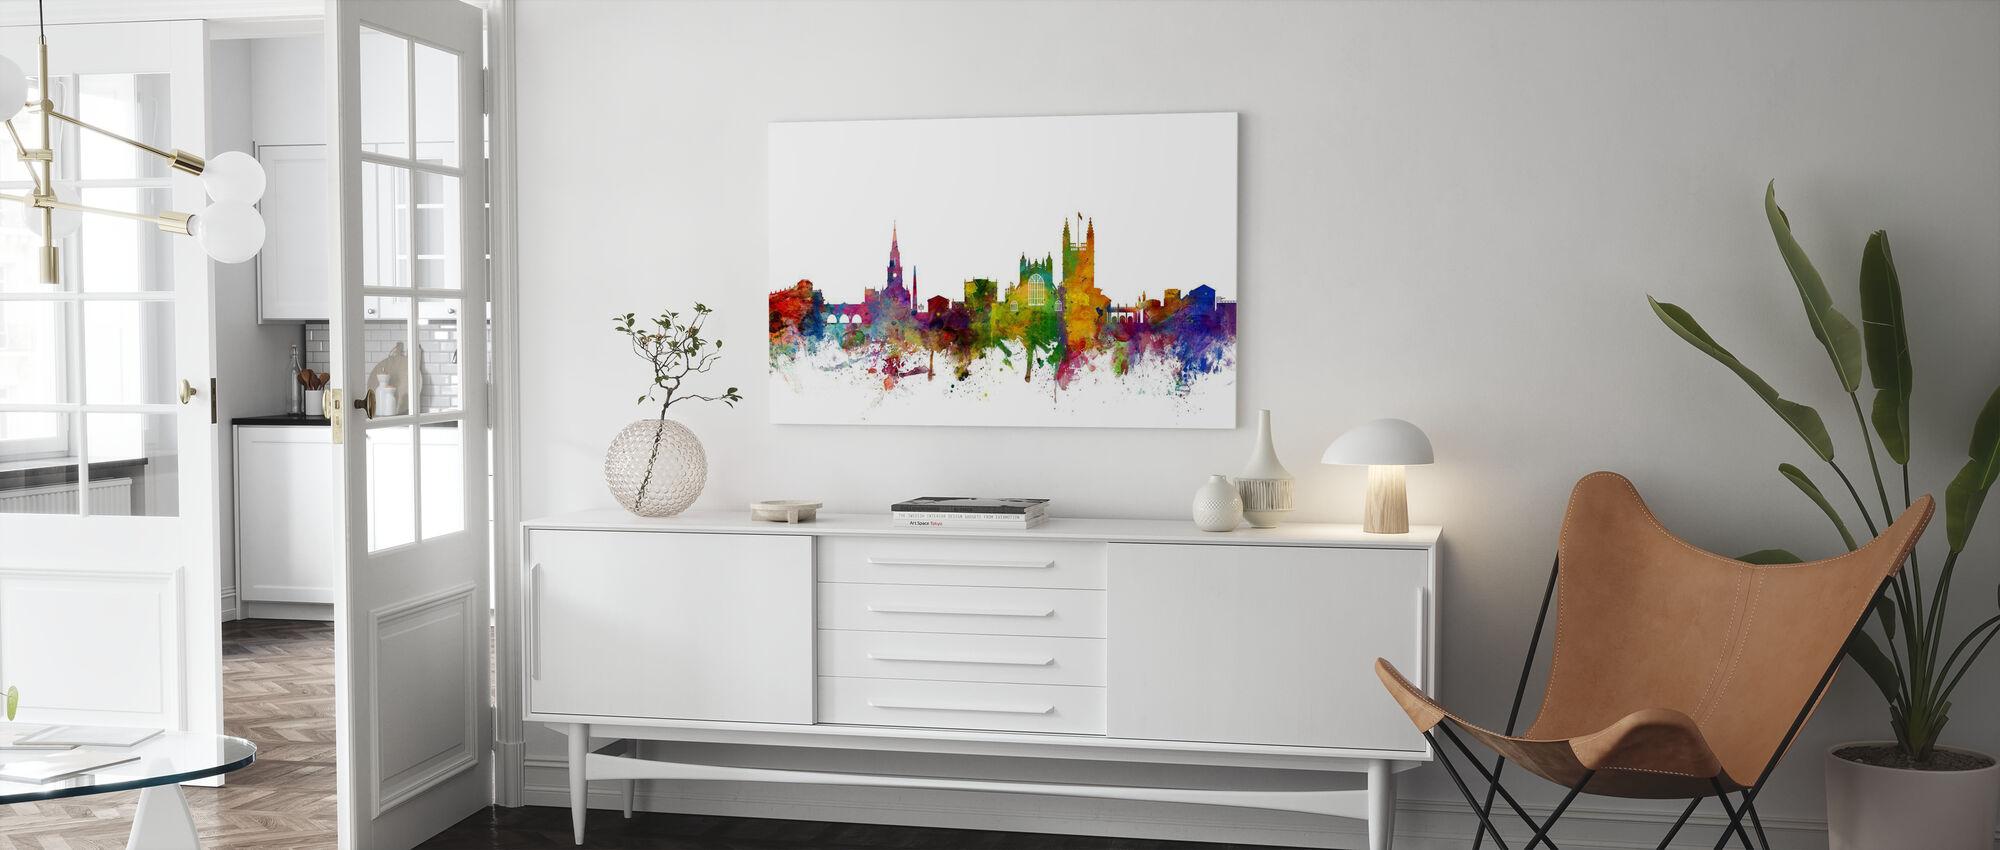 Bath England Skyline - Canvas print - Living Room